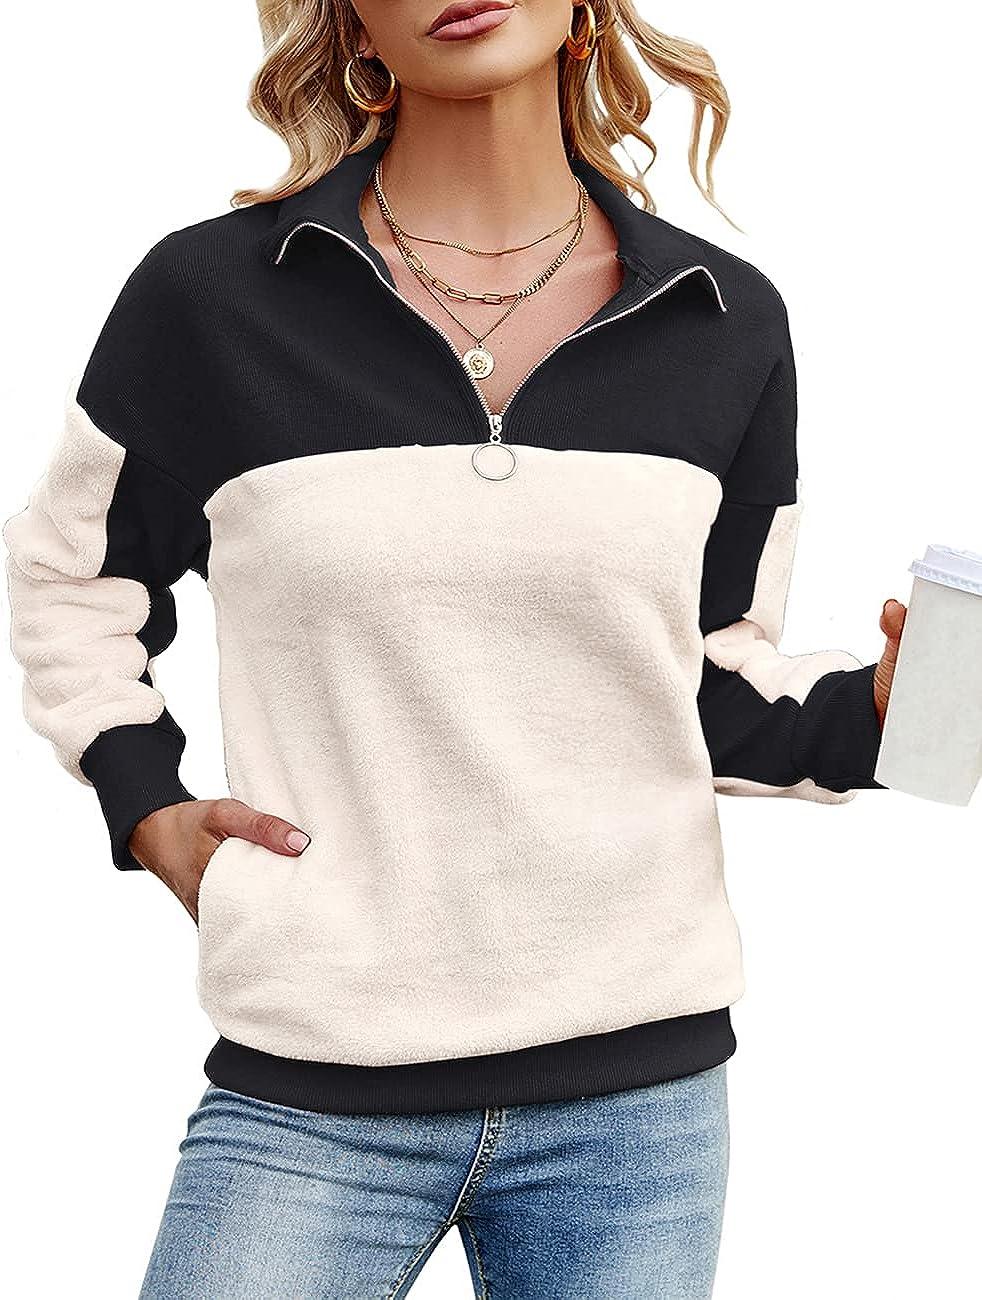 IECCP Womens Casual Stand Collar Sweatshirt Colorblock 1/4 Zip Long Sleeve Pullover Tops